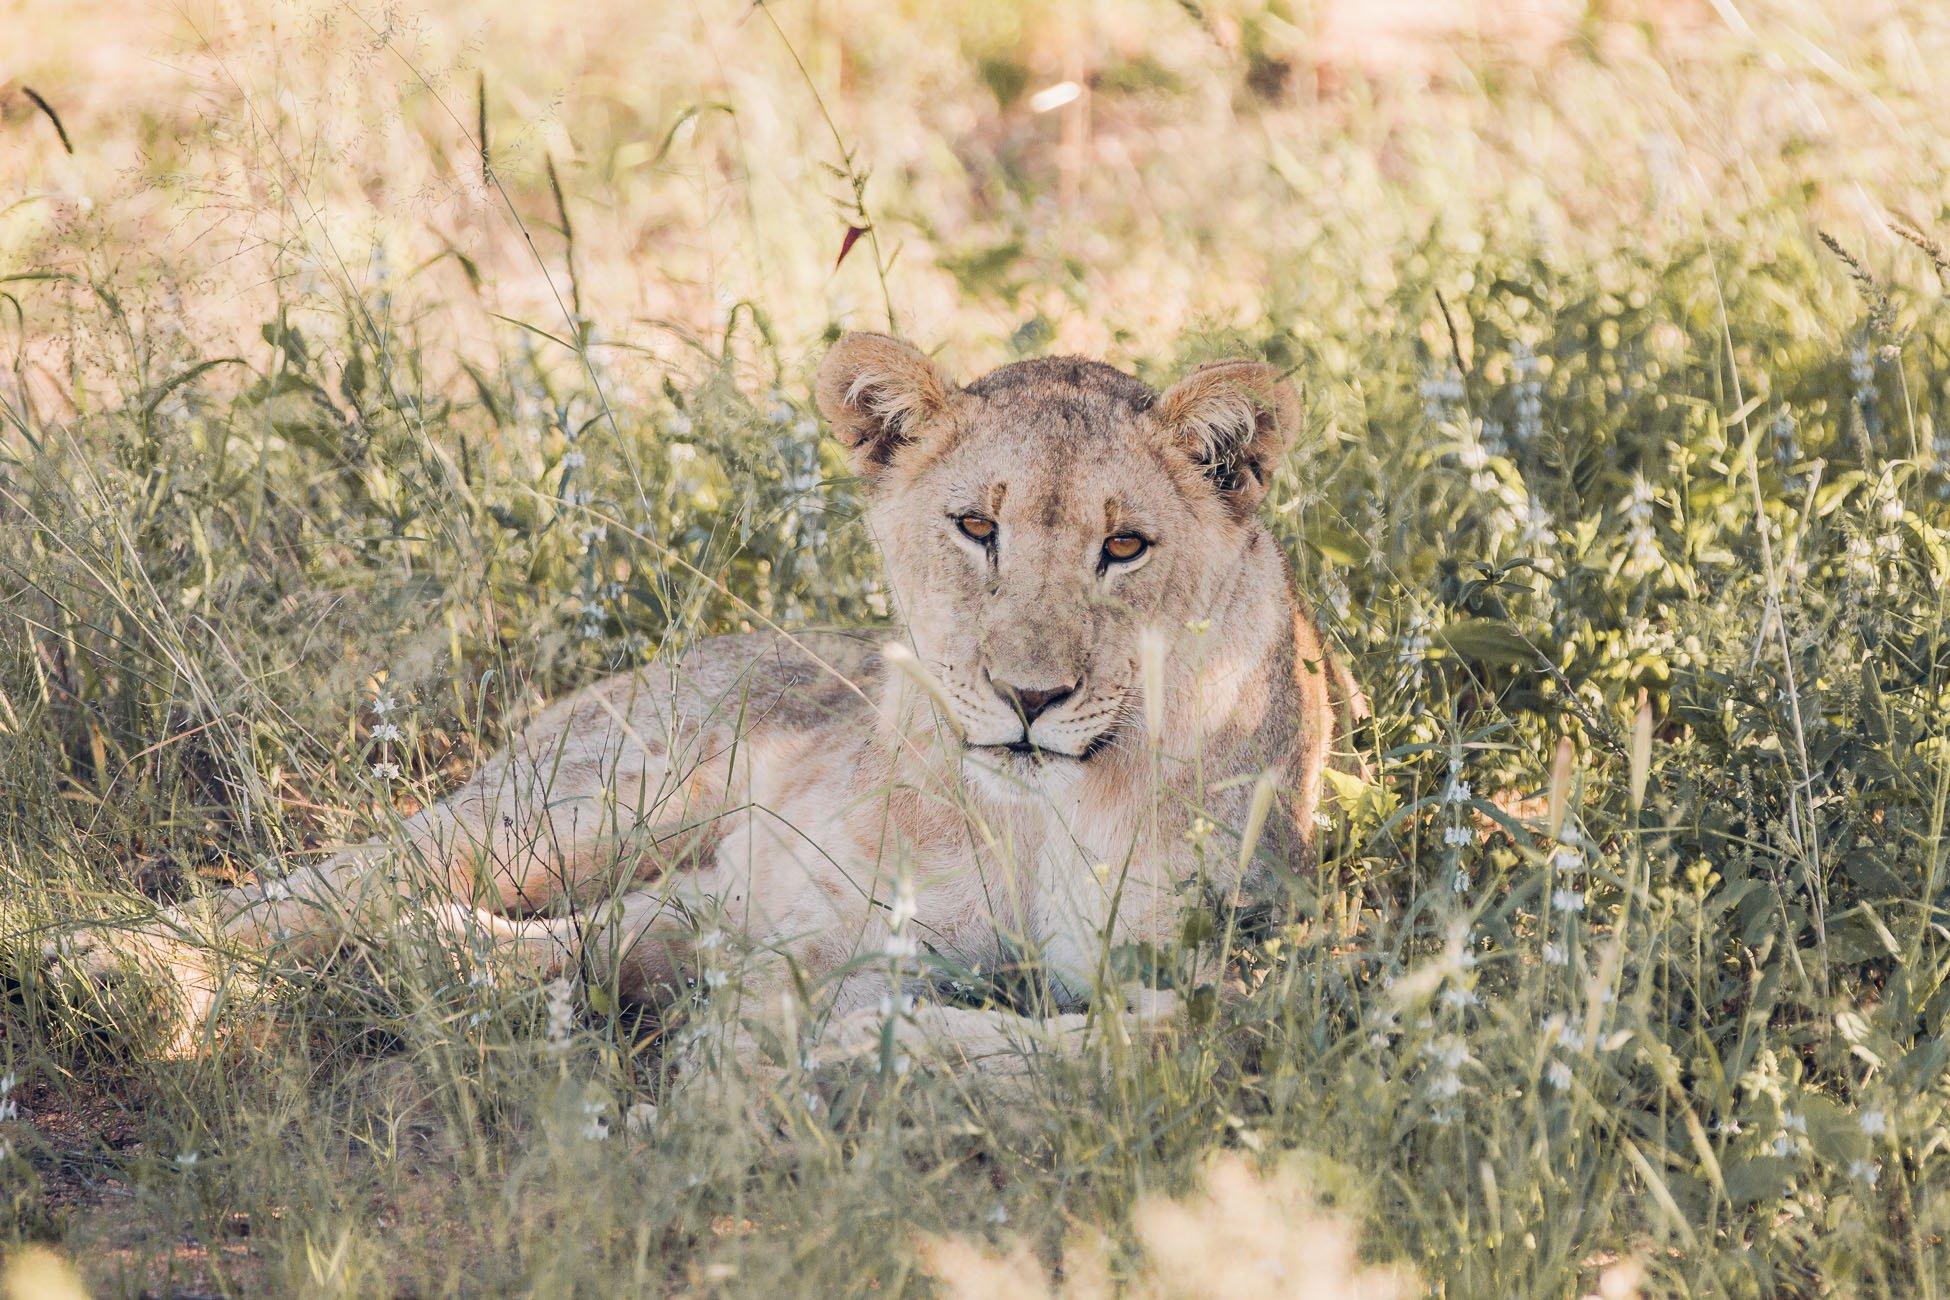 Lion Cub at a Safari in Namibia